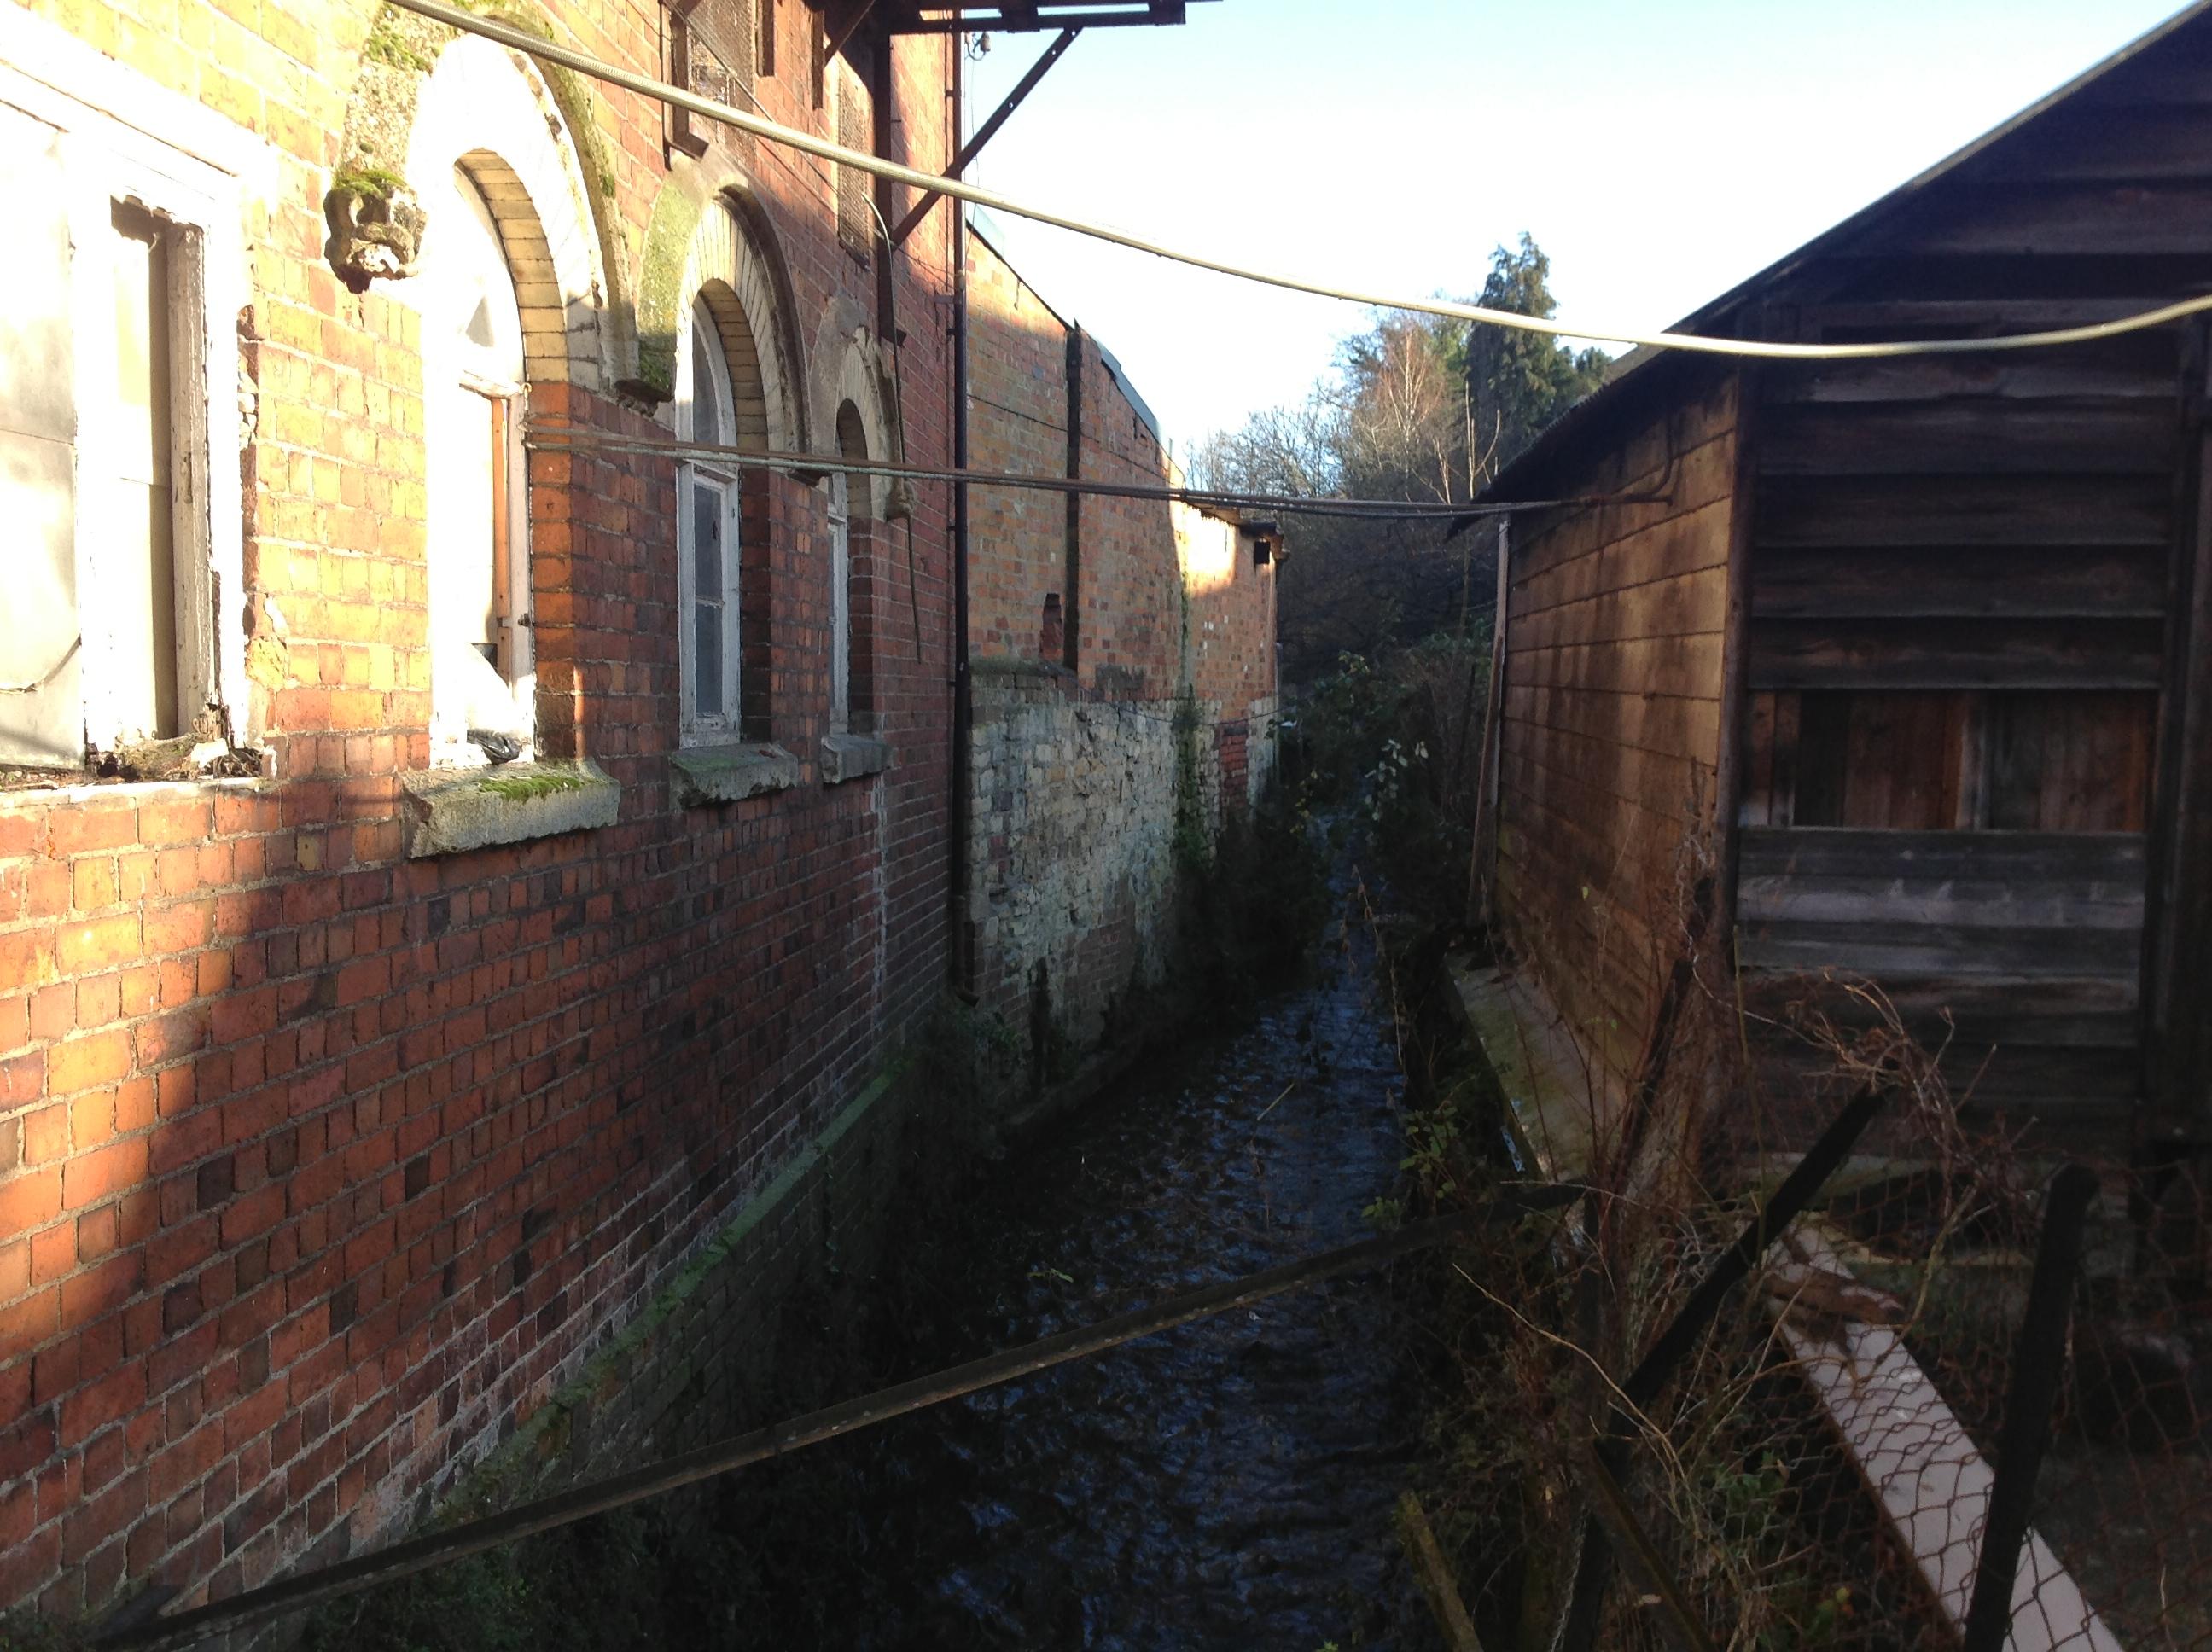 Radical Stroud - Stuart Butler - The Slad Brook in Stroud